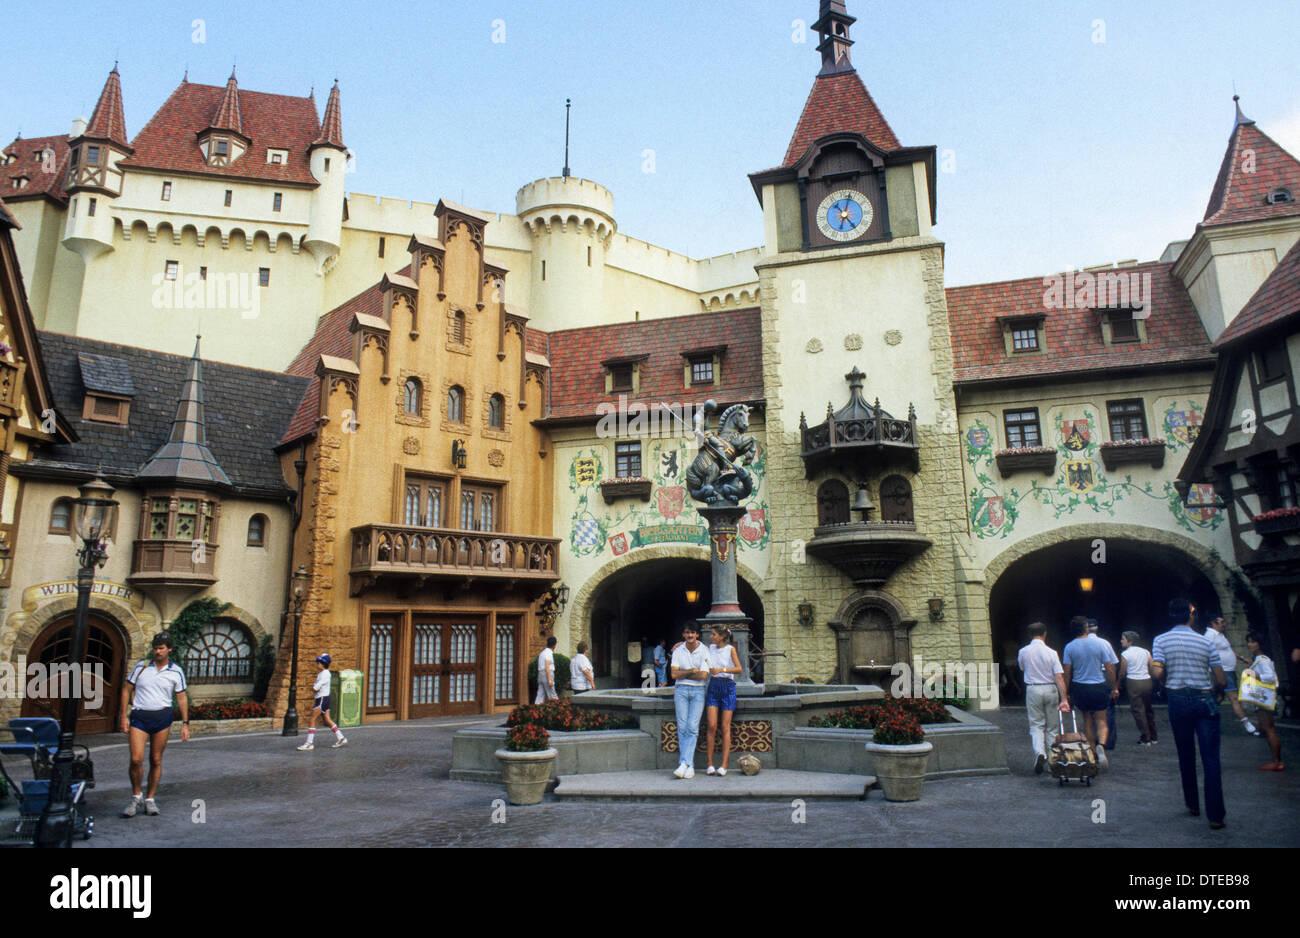 Germany replica at epcot world showcase pavilion orlando for Replica mobel deutschland